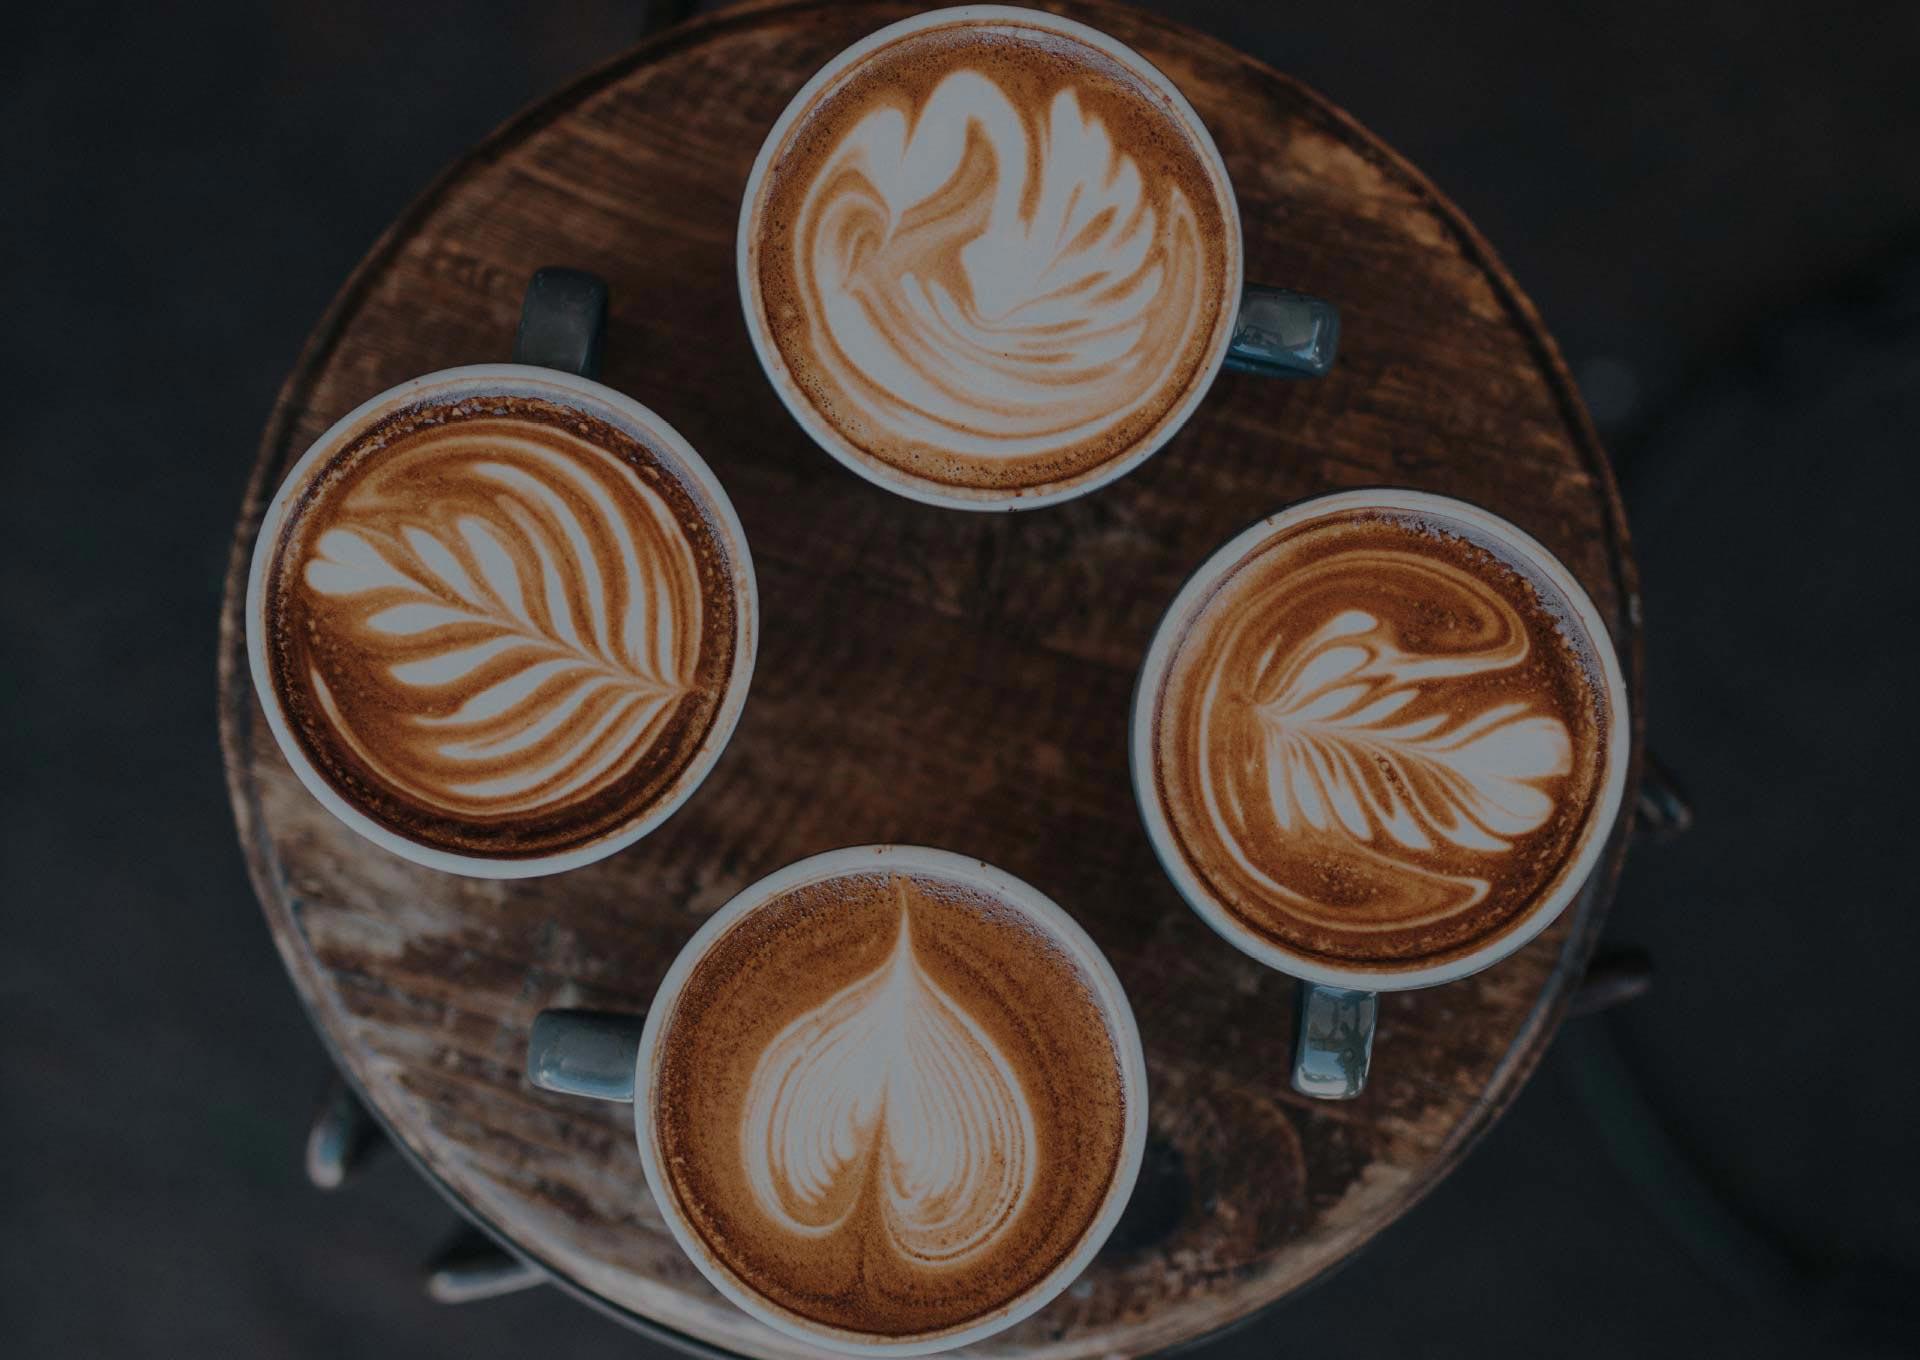 Hej Specialty Coffee